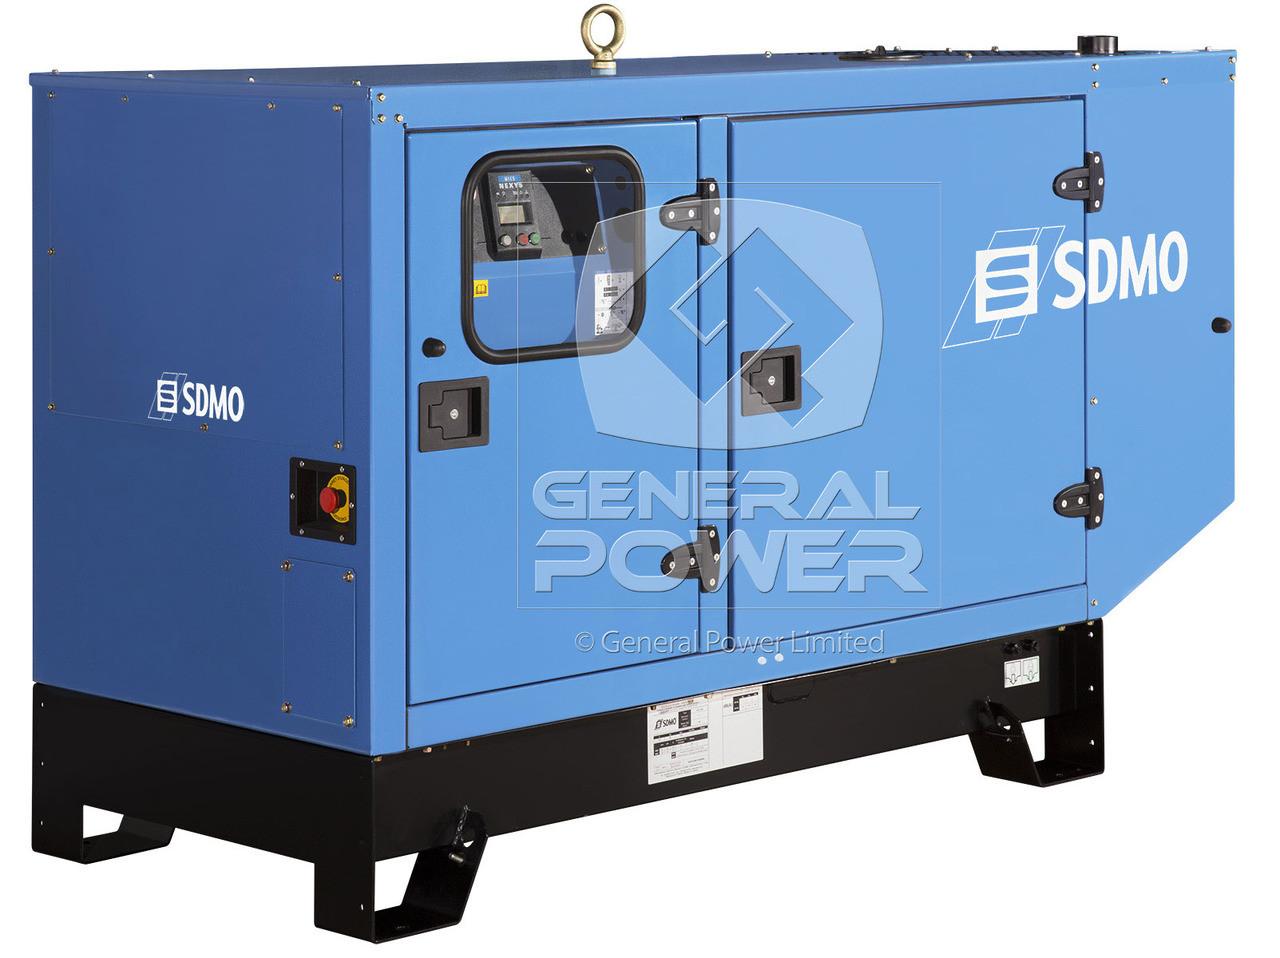 20 kW 20kVA Diesel Generator - SDMO | J20UM IV | General Power